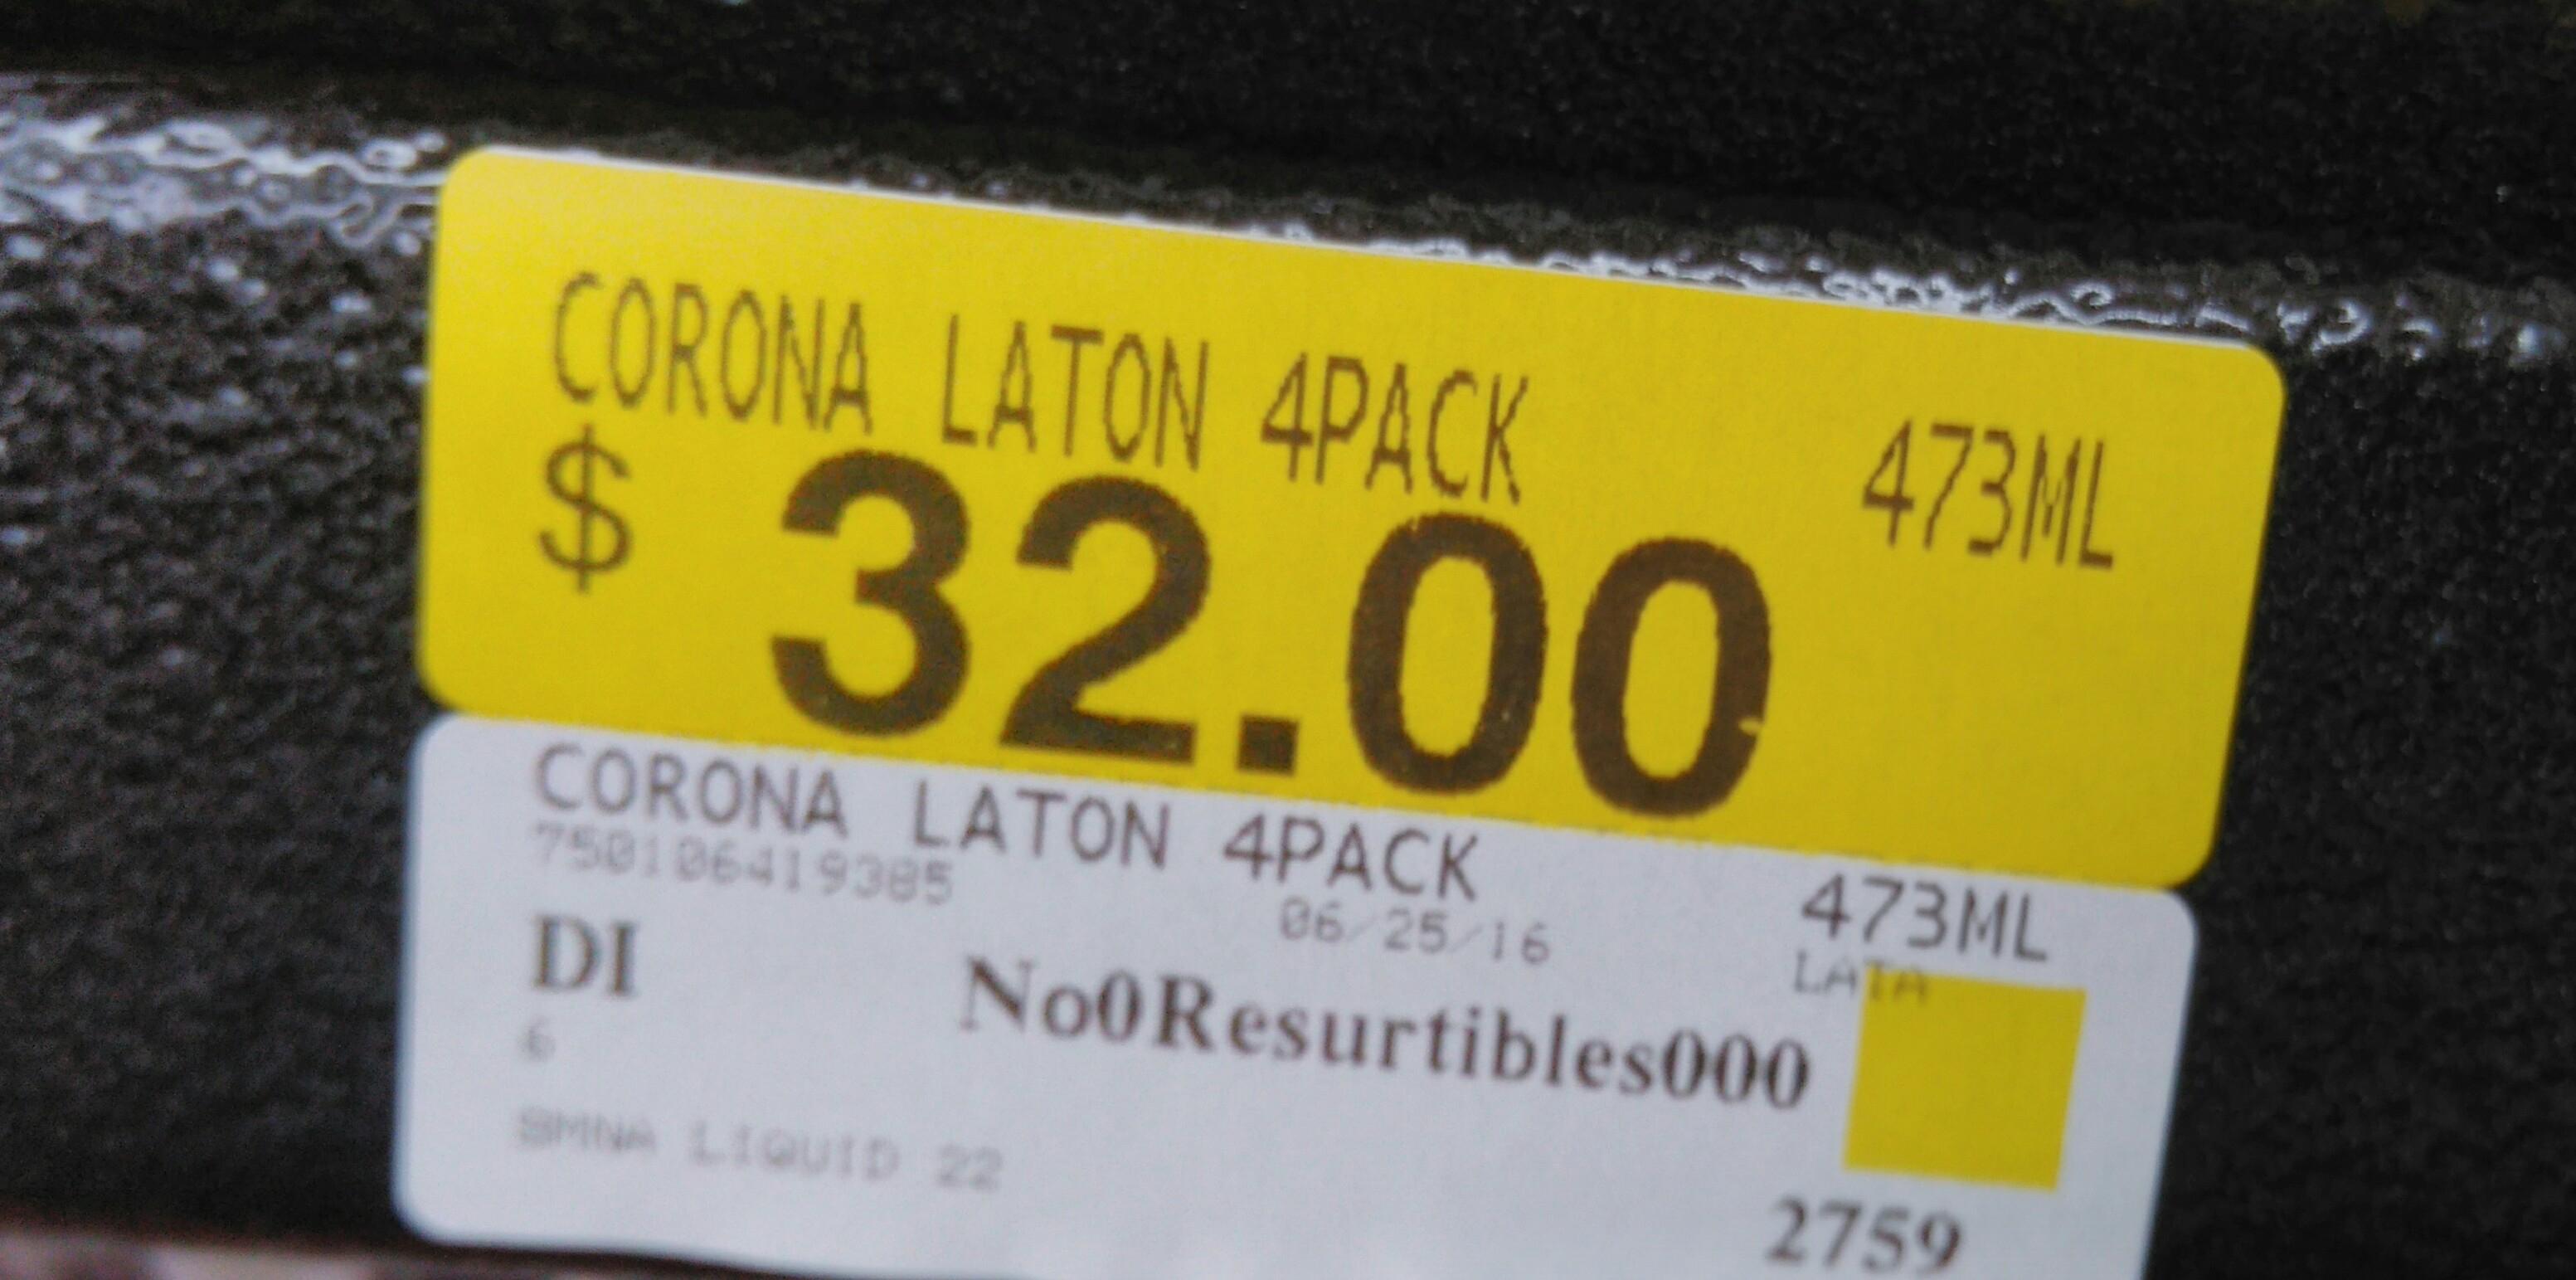 Walmart 57 San Luis Potosi: Corona laton de 4 pack a $32